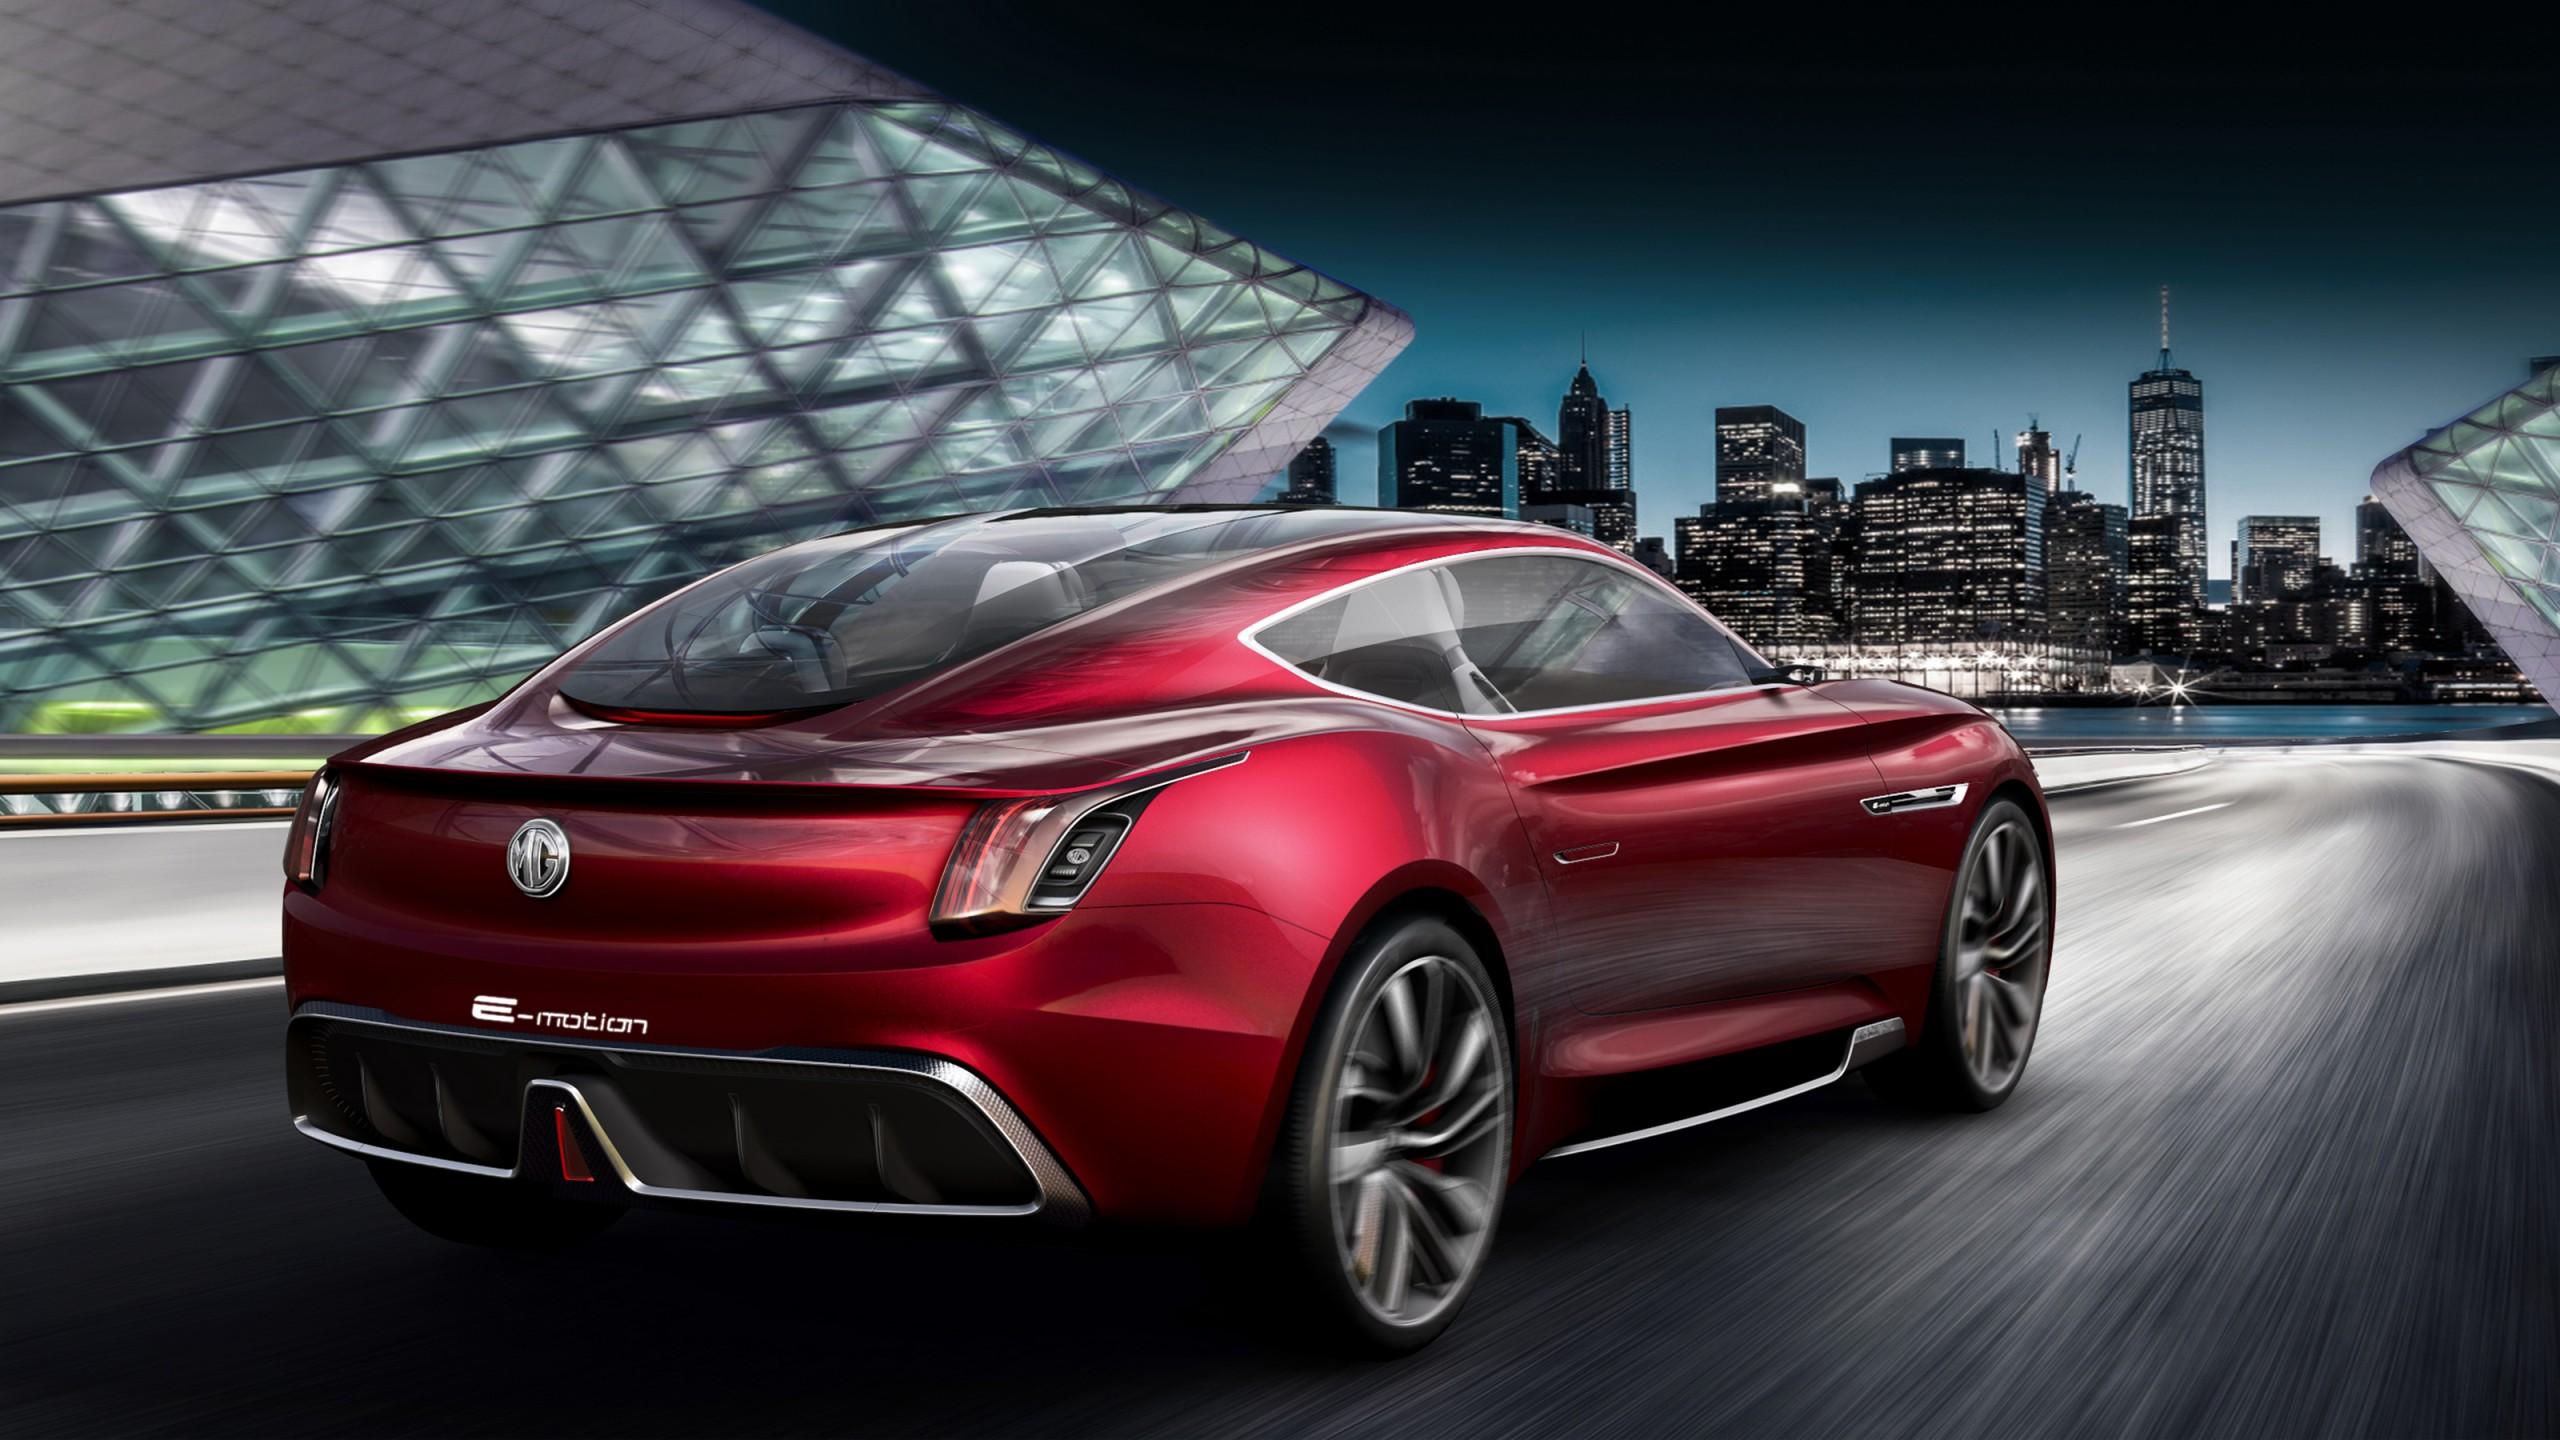 Mg E Motion Concept Car 4 Wallpaper Hd Car Wallpapers